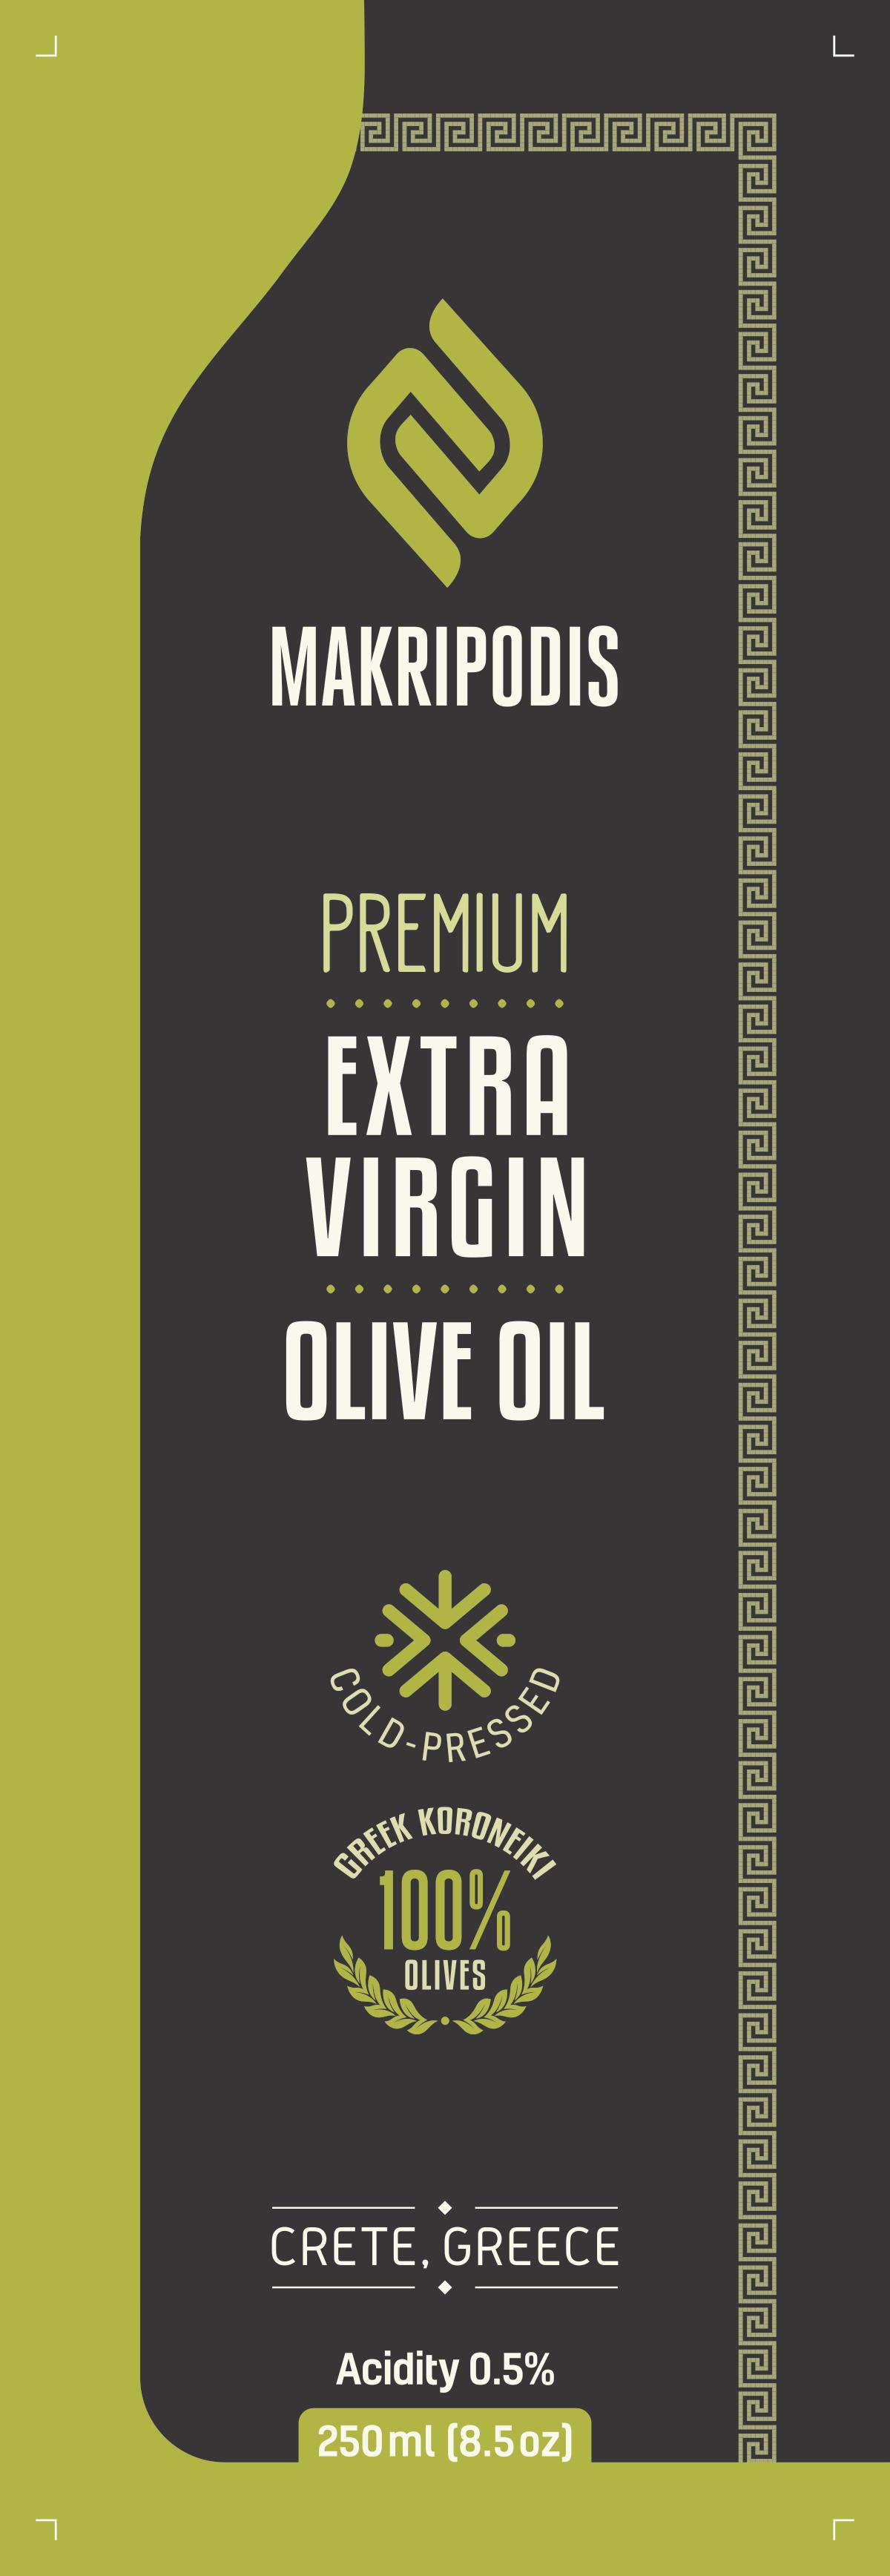 Makripodis Olive Oil Sell Sheet